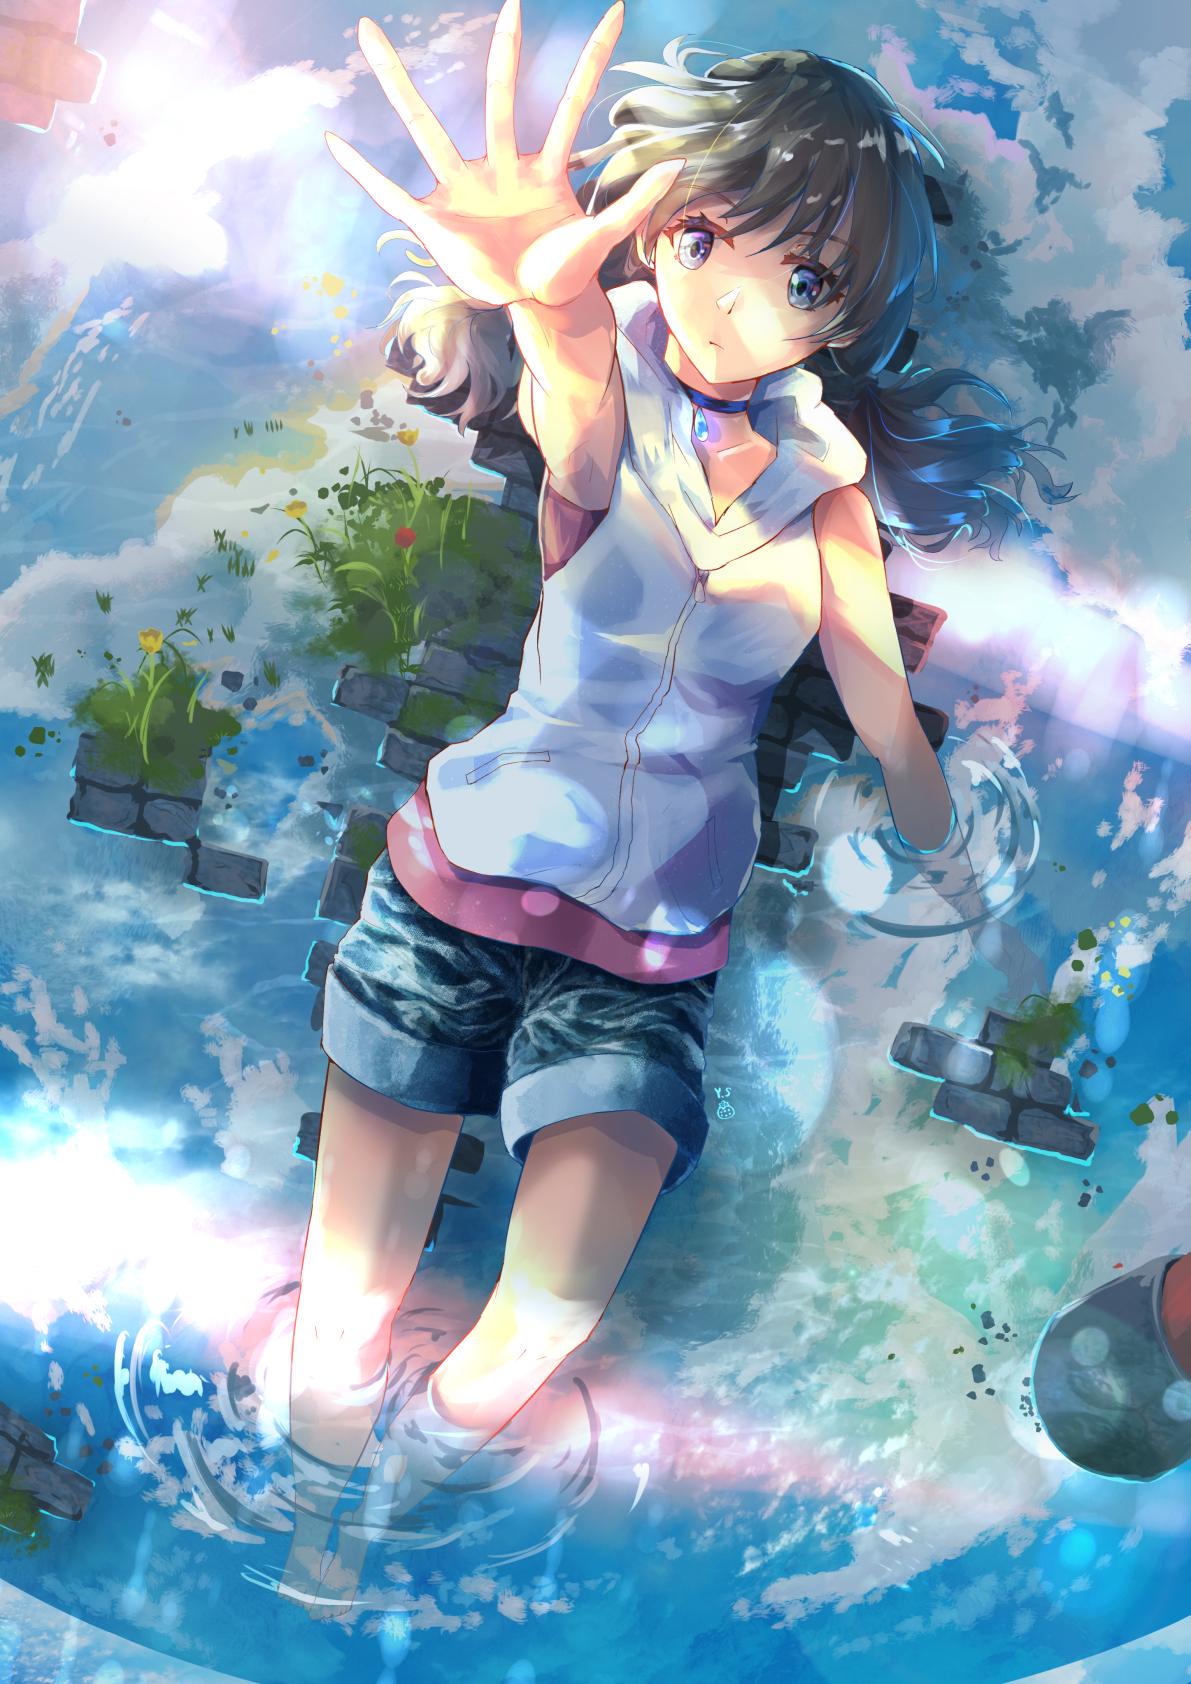 Pin by 冠宇 陳 on 天氣之子 Anime scenery, Anime images, Anime art